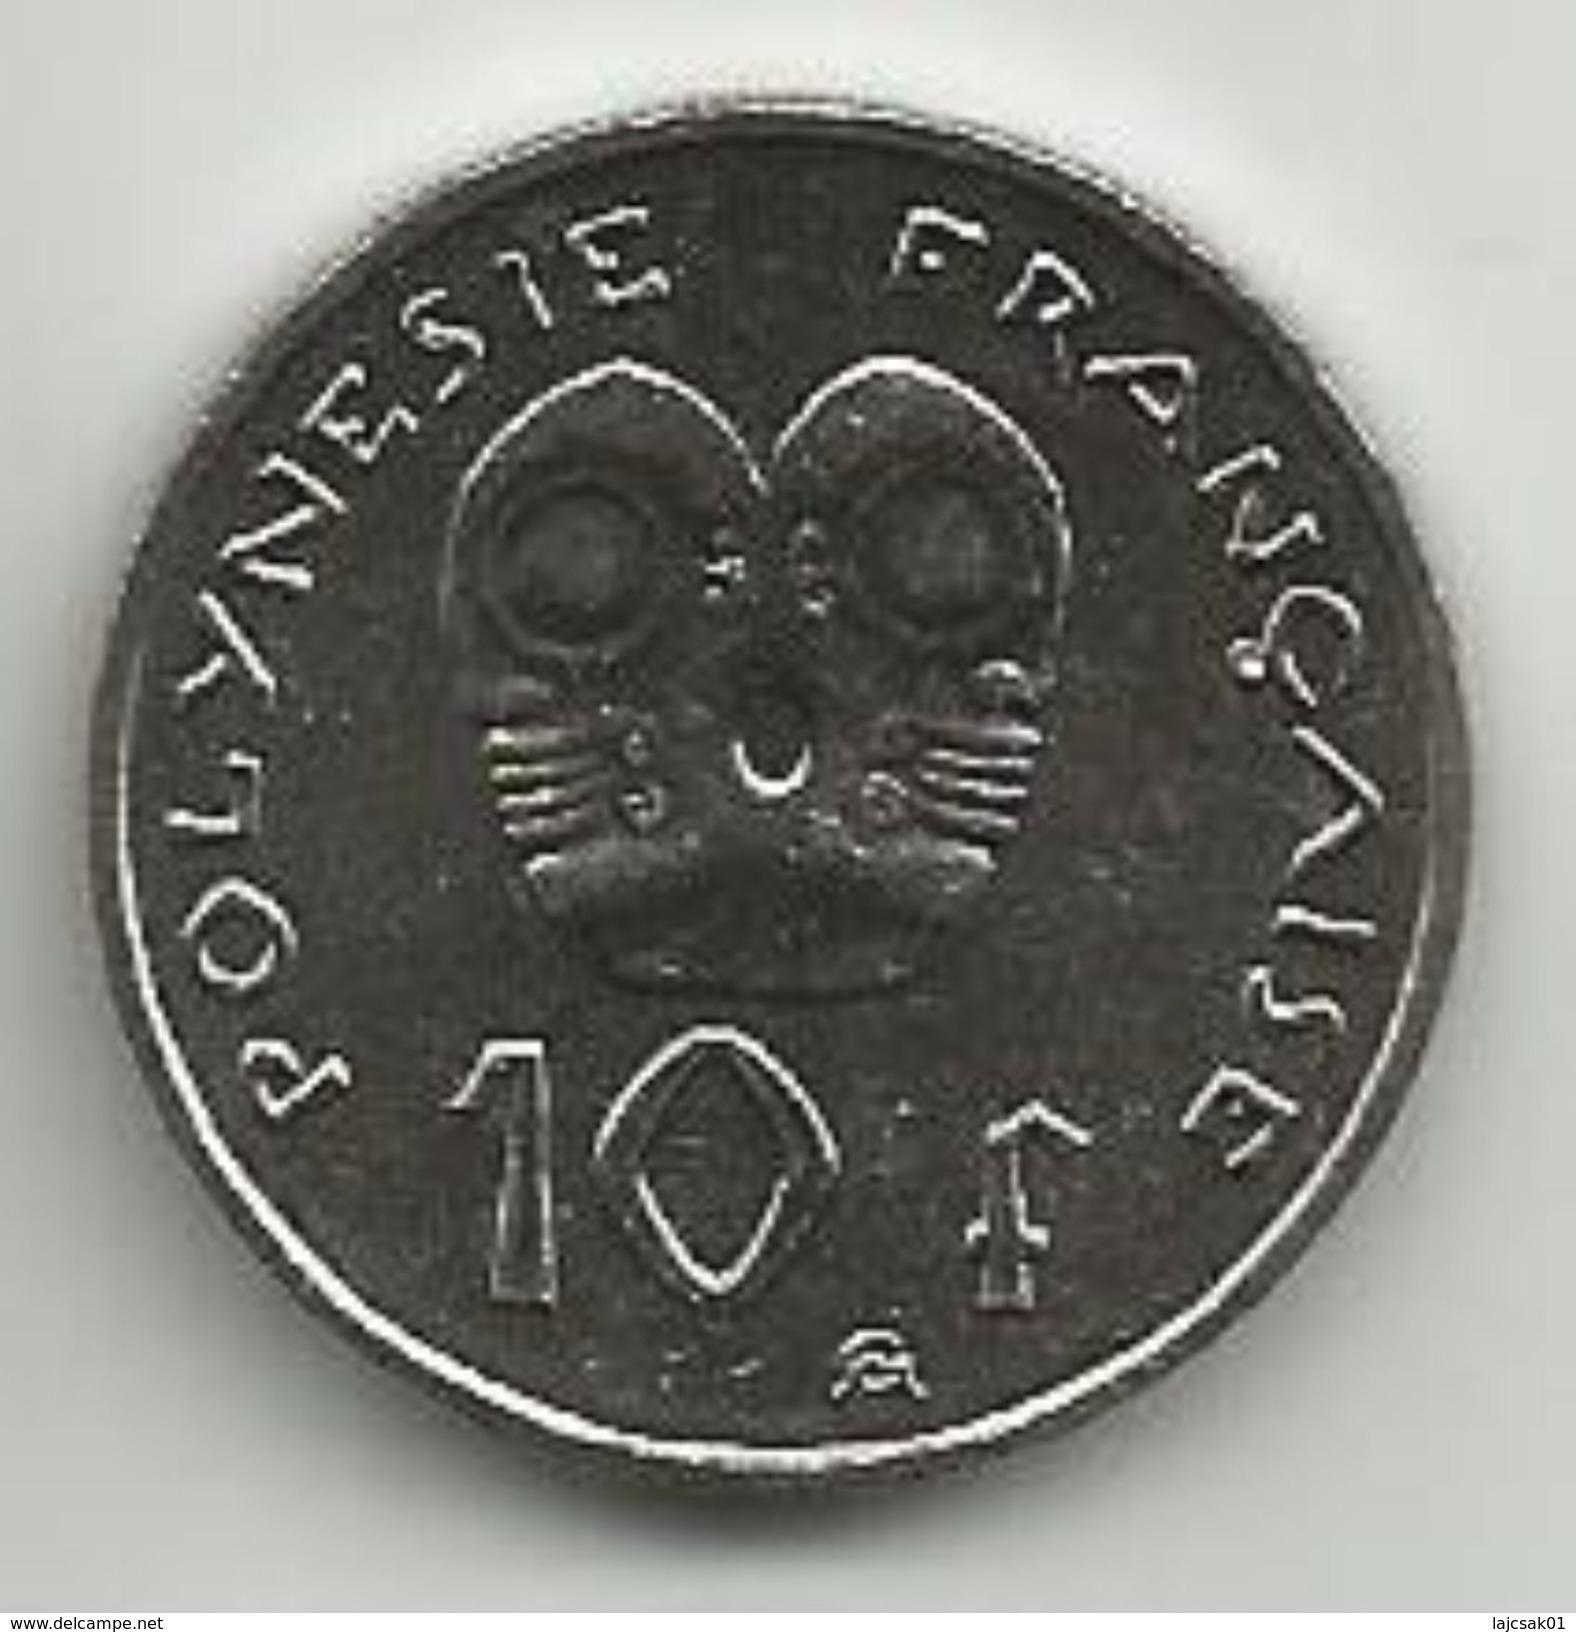 French Polynesia 10 Francs 2003. KM#8 - Polynésie Française